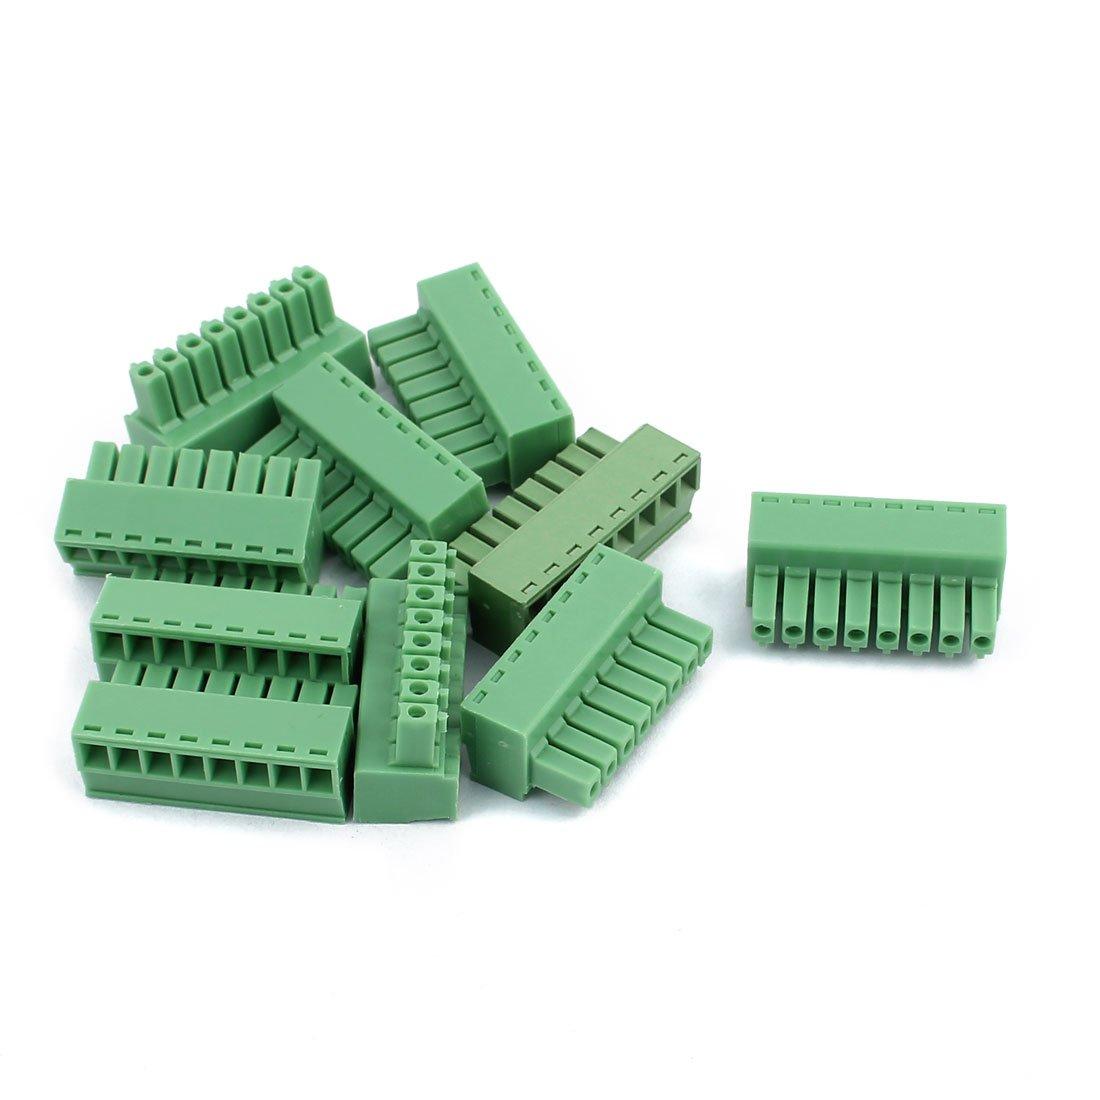 5pcs 2-Pin Pitch Screws Terminal Block Connectors 3.5mm